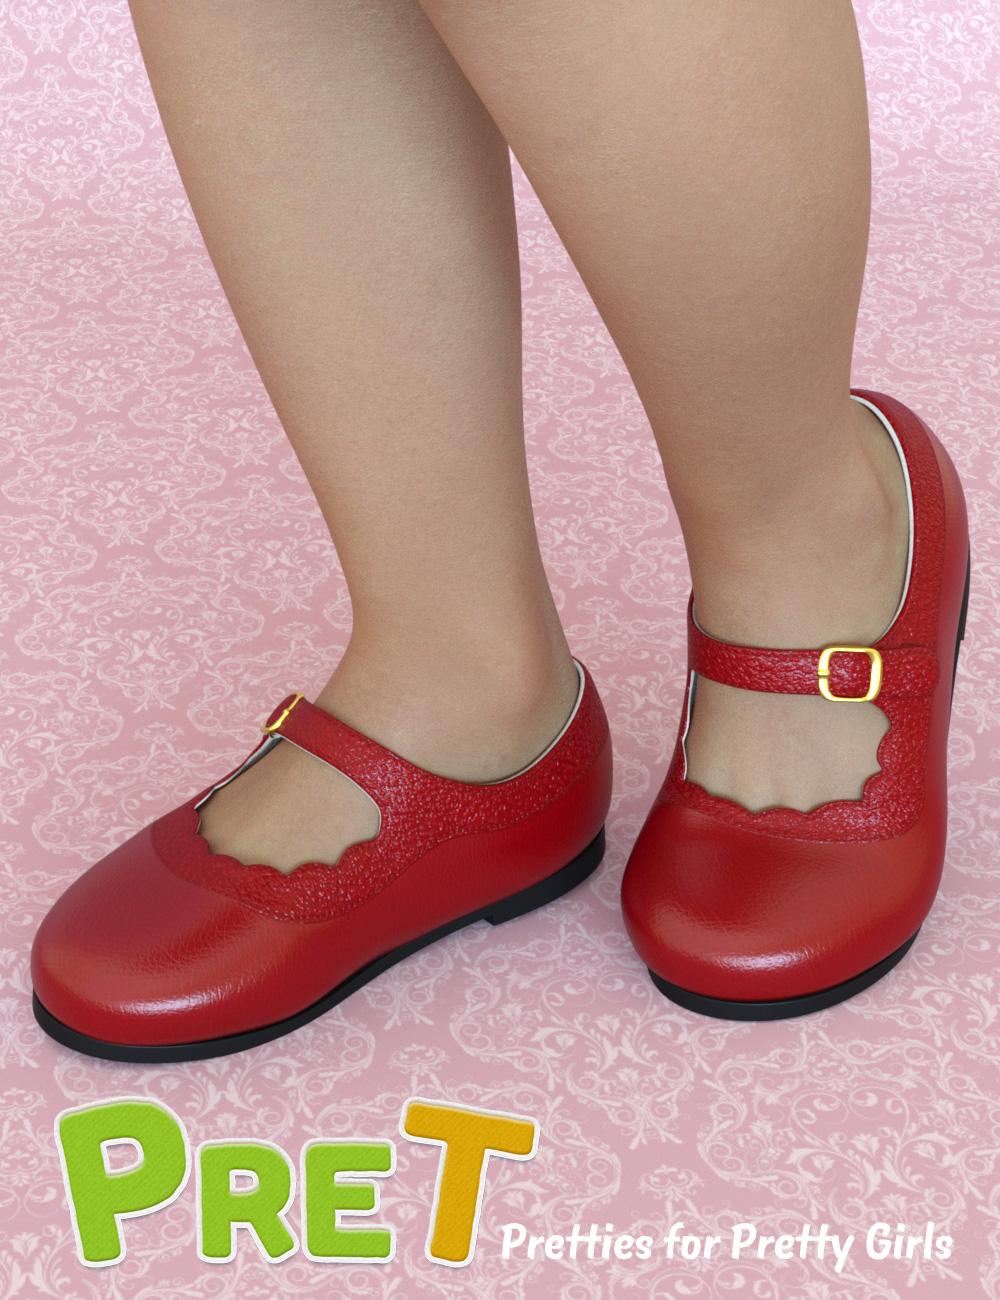 PreT Girls Strap Shoes for Genesis 8 Females by: elleque, 3D Models by Daz 3D